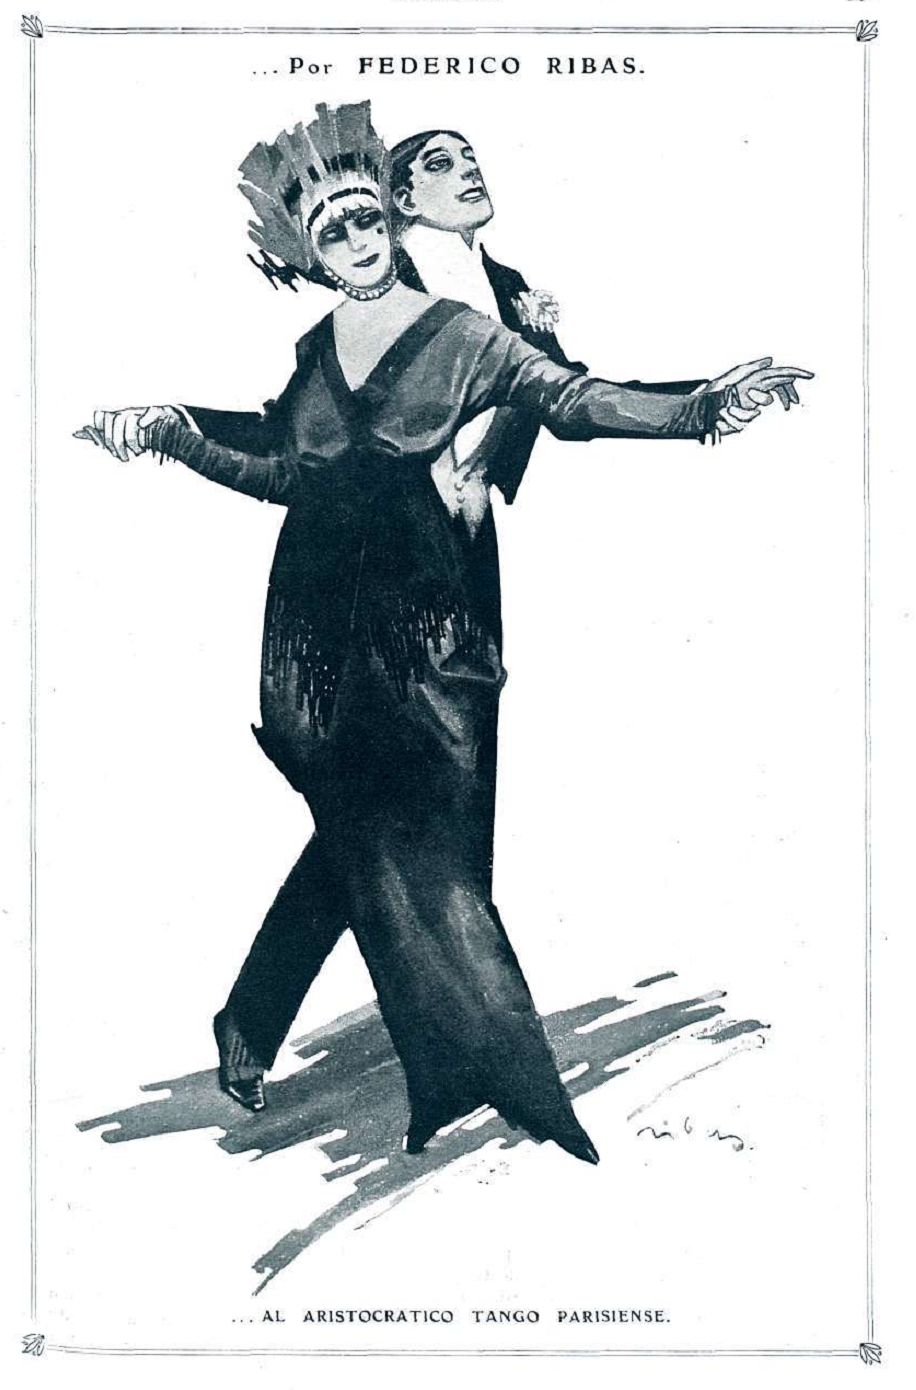 federico ribas tango